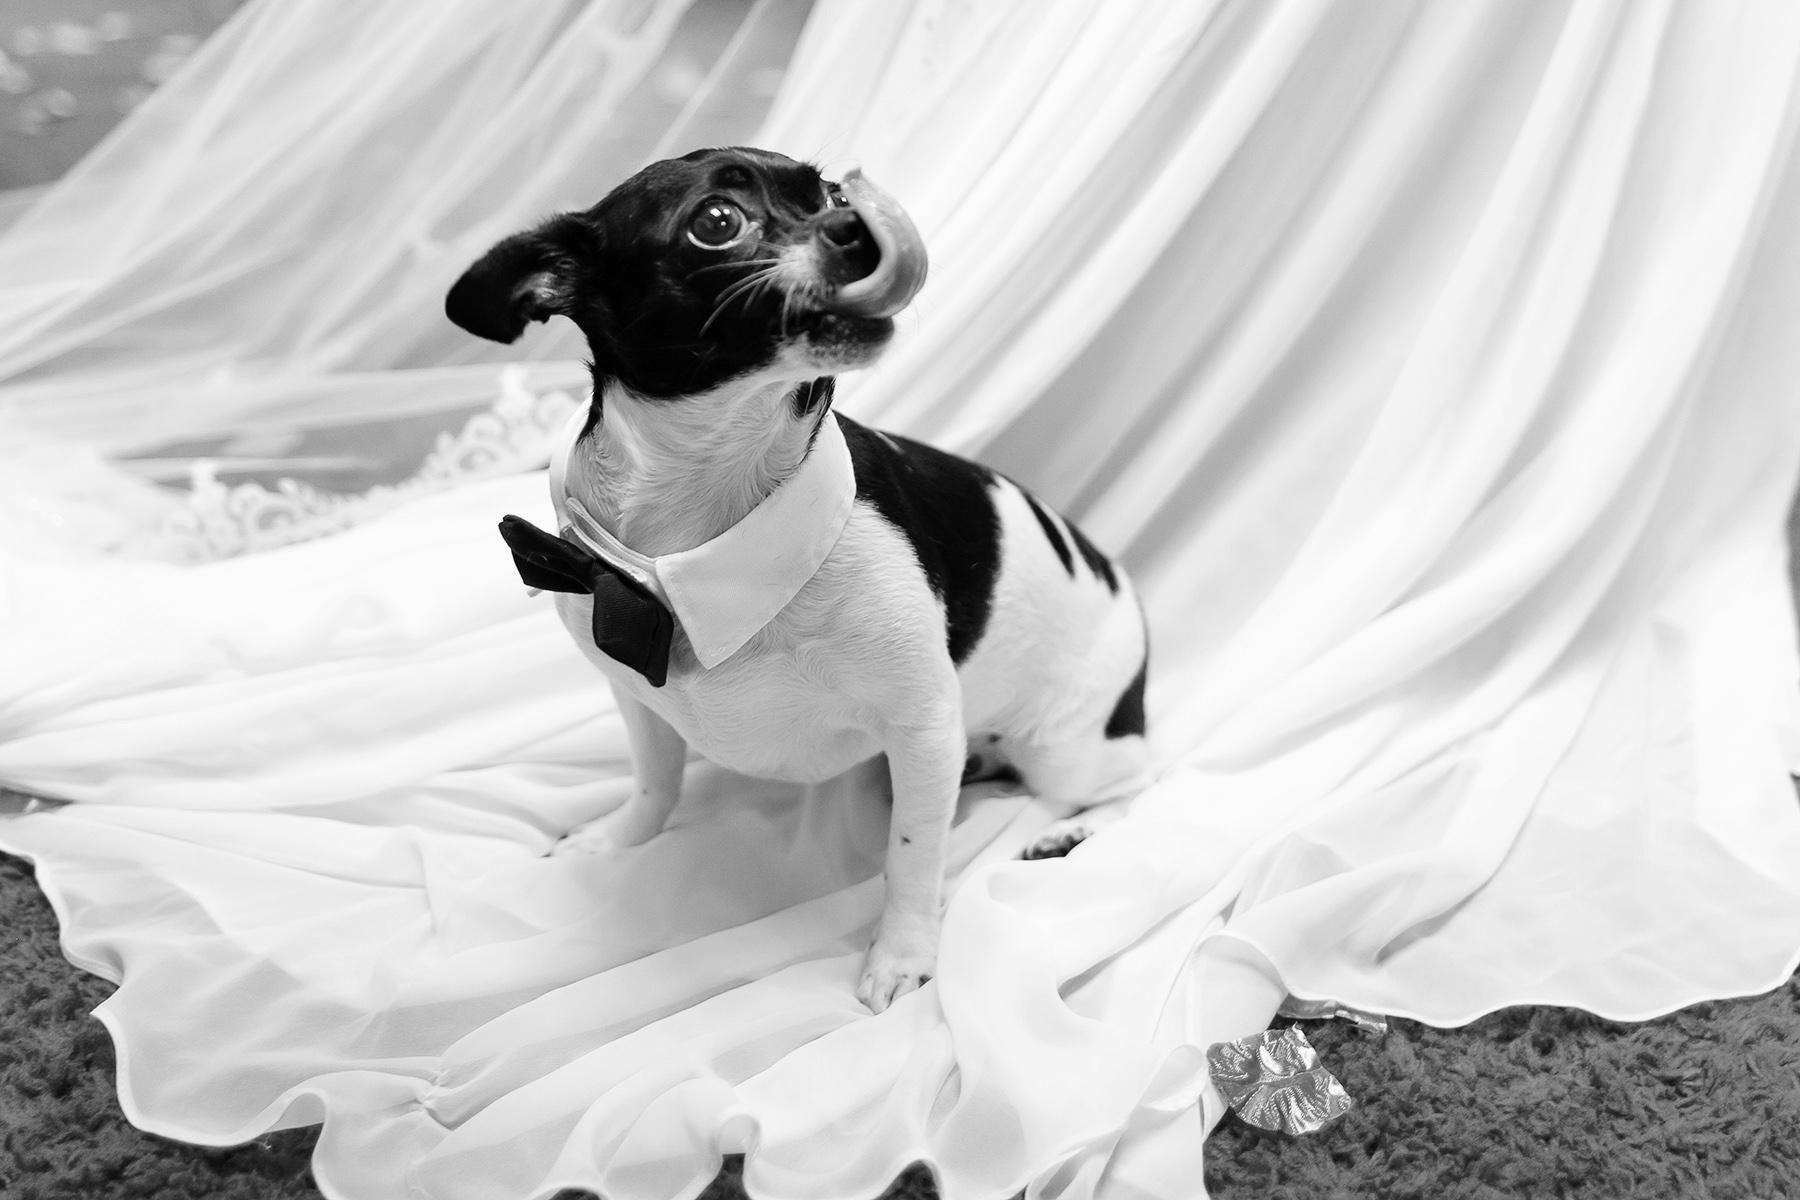 Canine Backyard Wedding Photos | a Chihuahua, sits on the bride's wedding dress